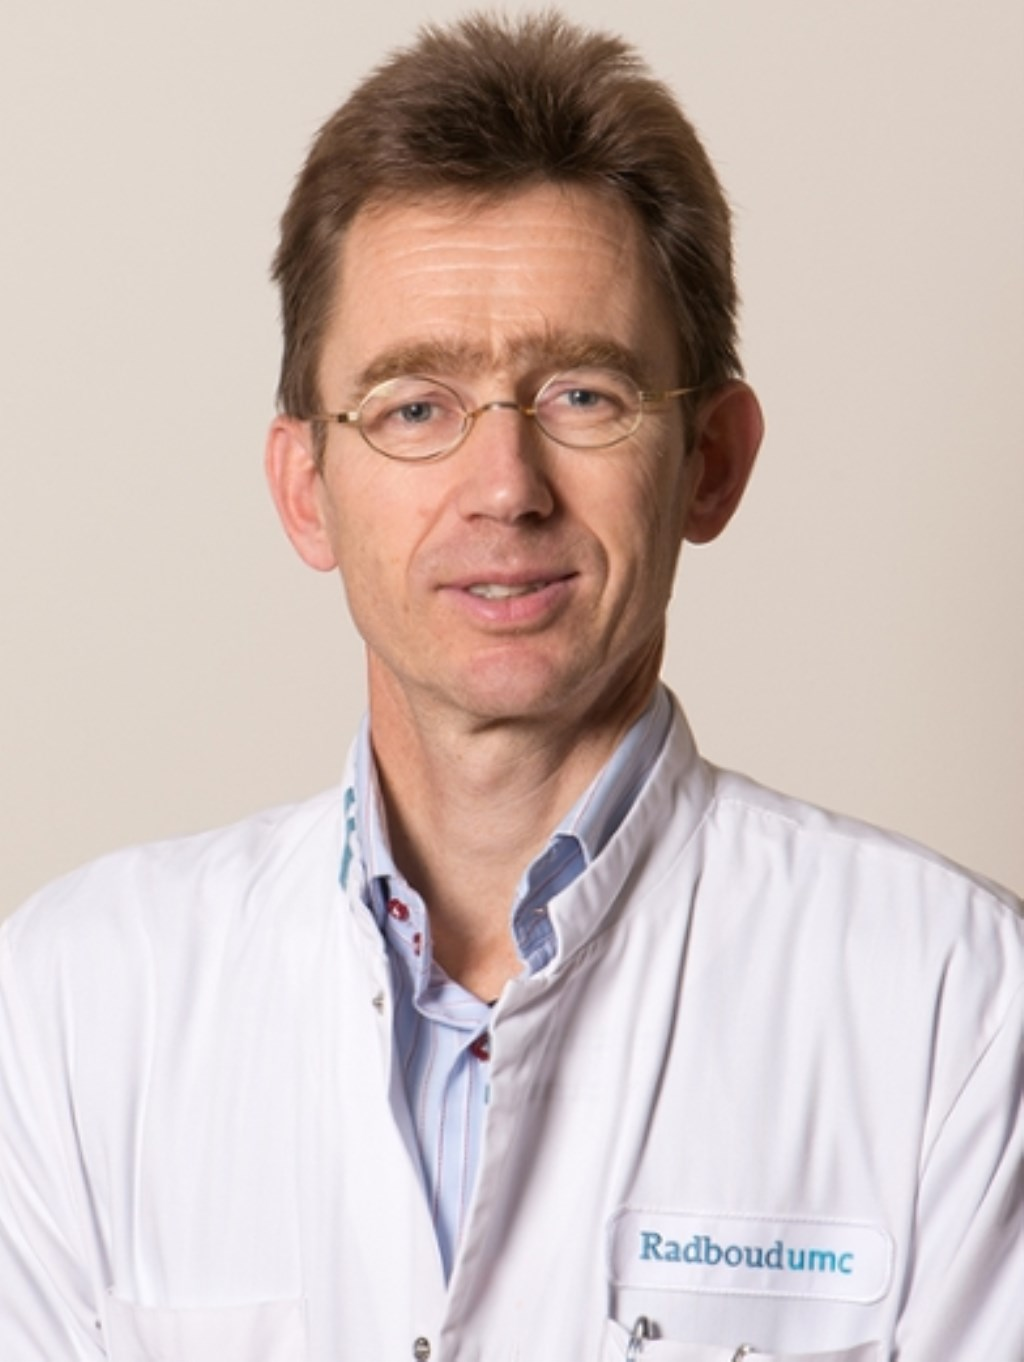 Rrof. dr. M Olde Rikkert. (foto: Radboud universiteit)